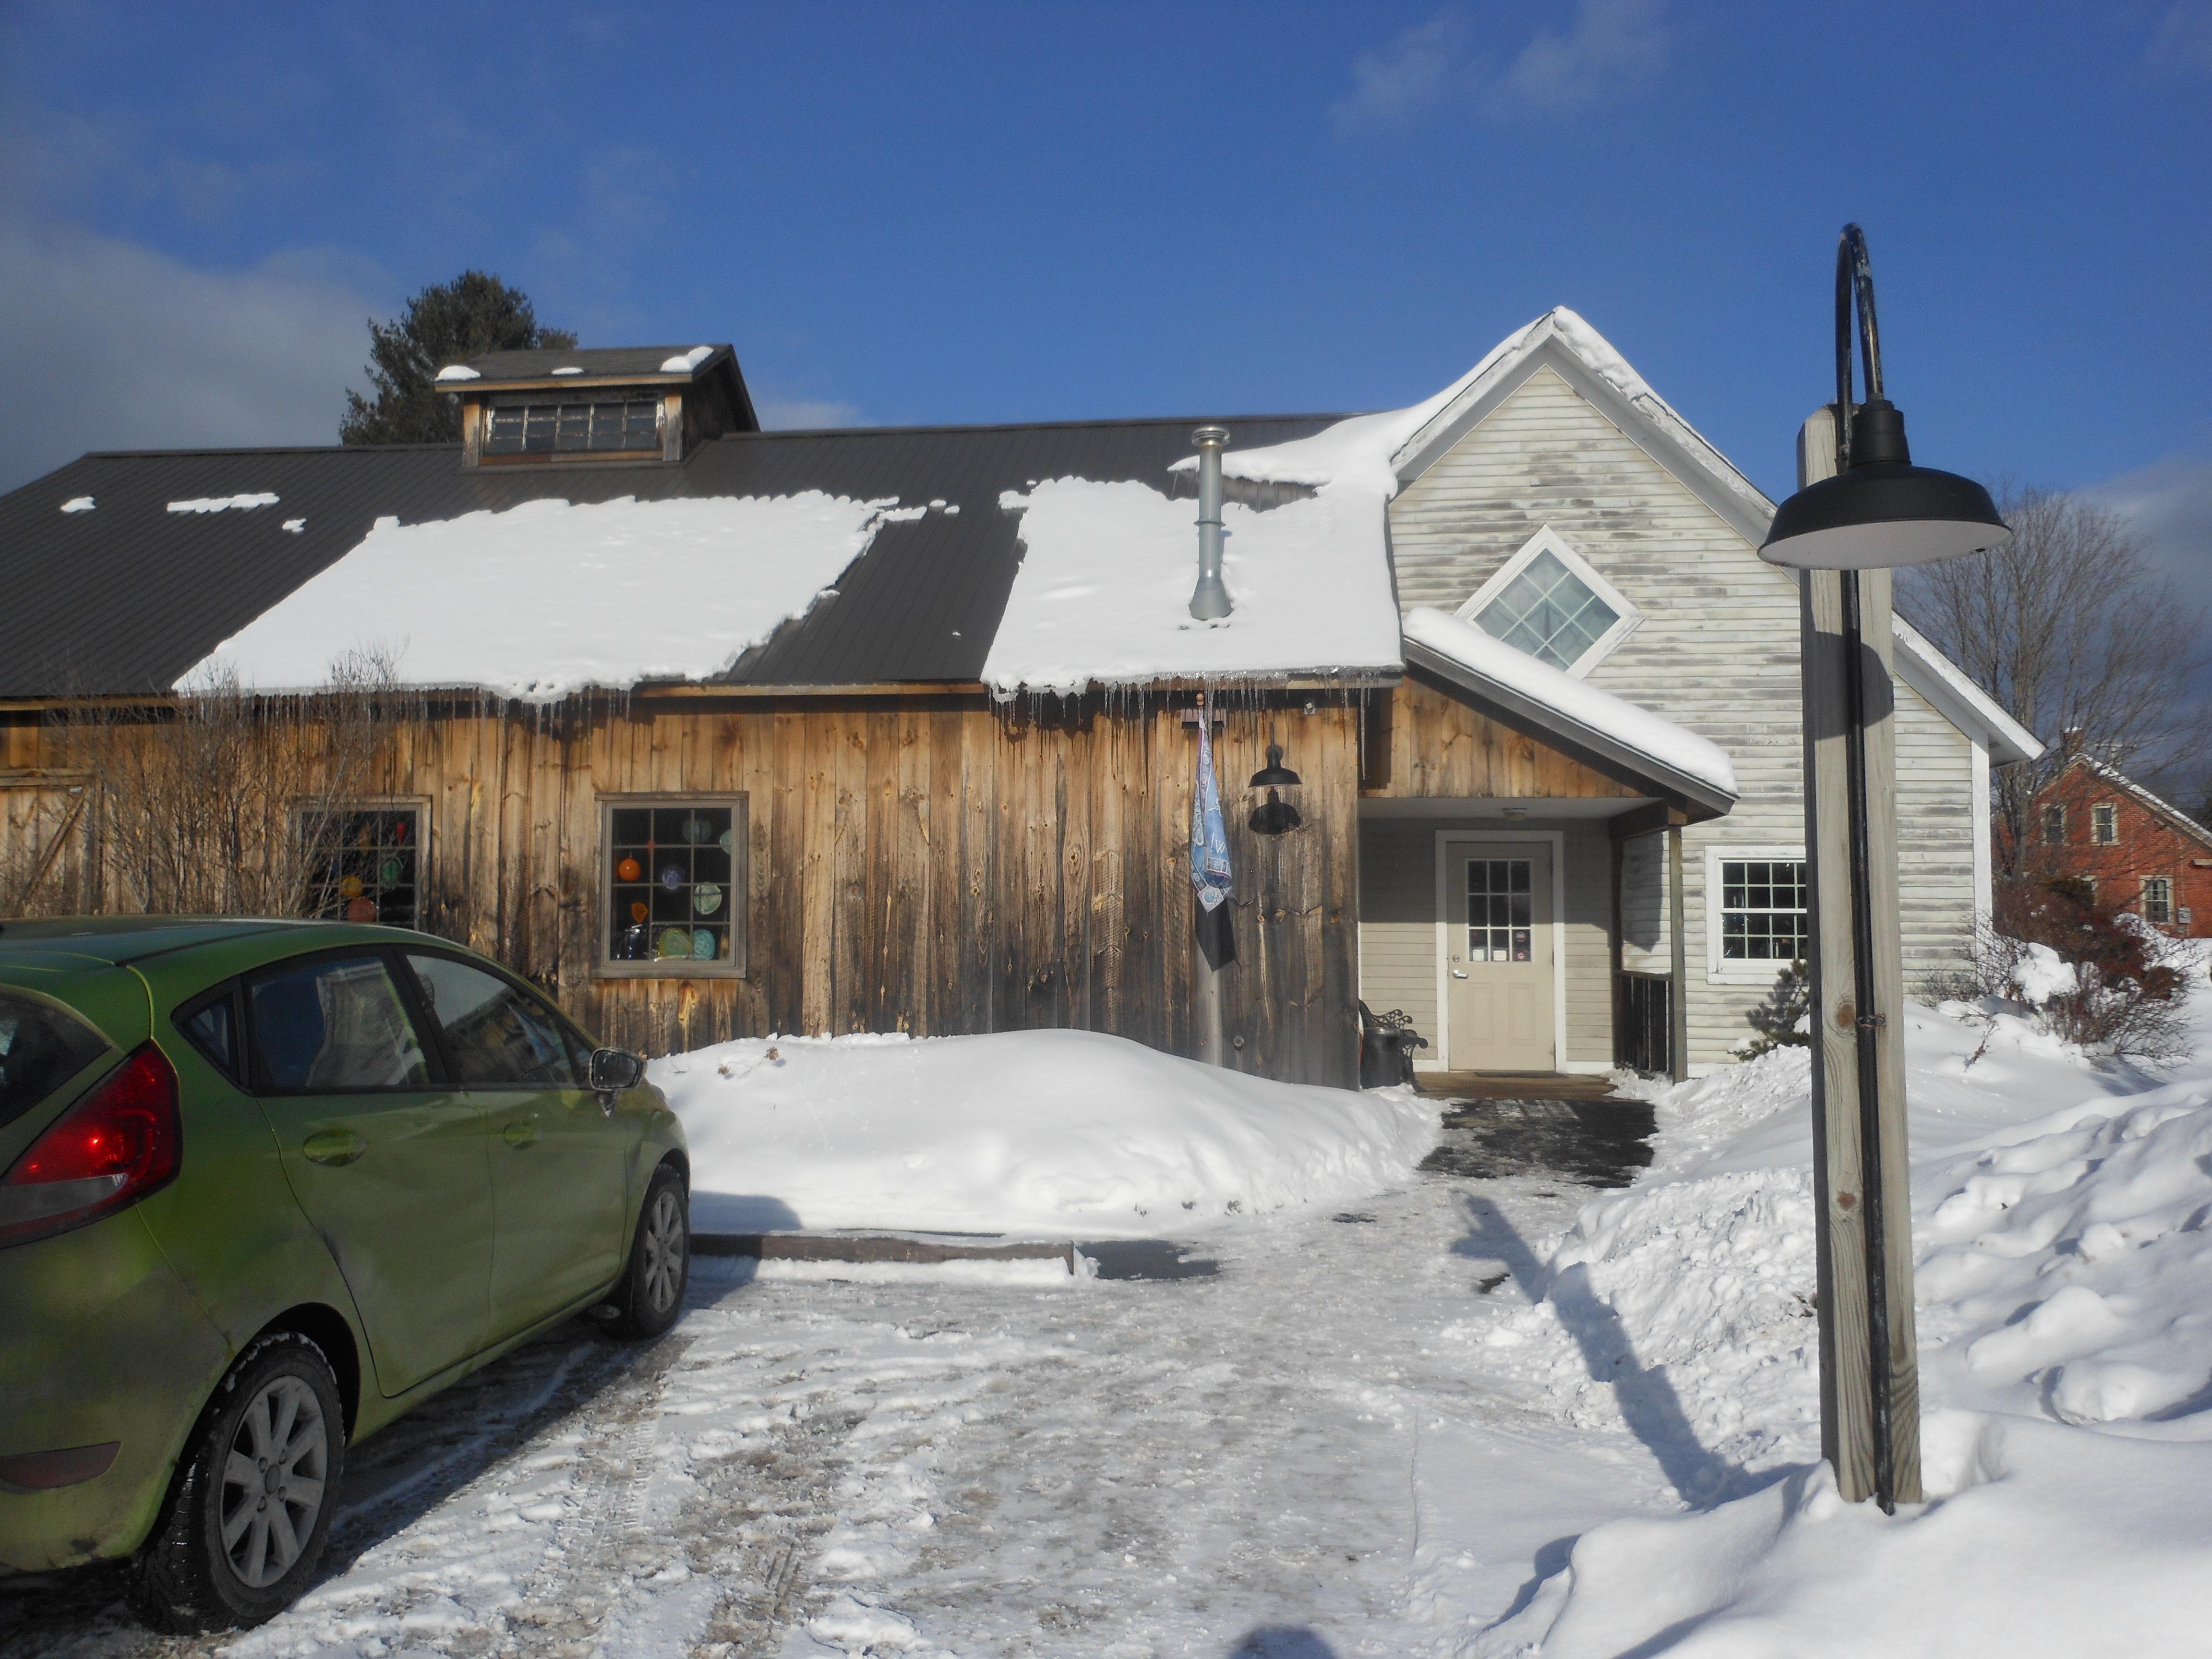 Ski Lodges in Northern Vermont